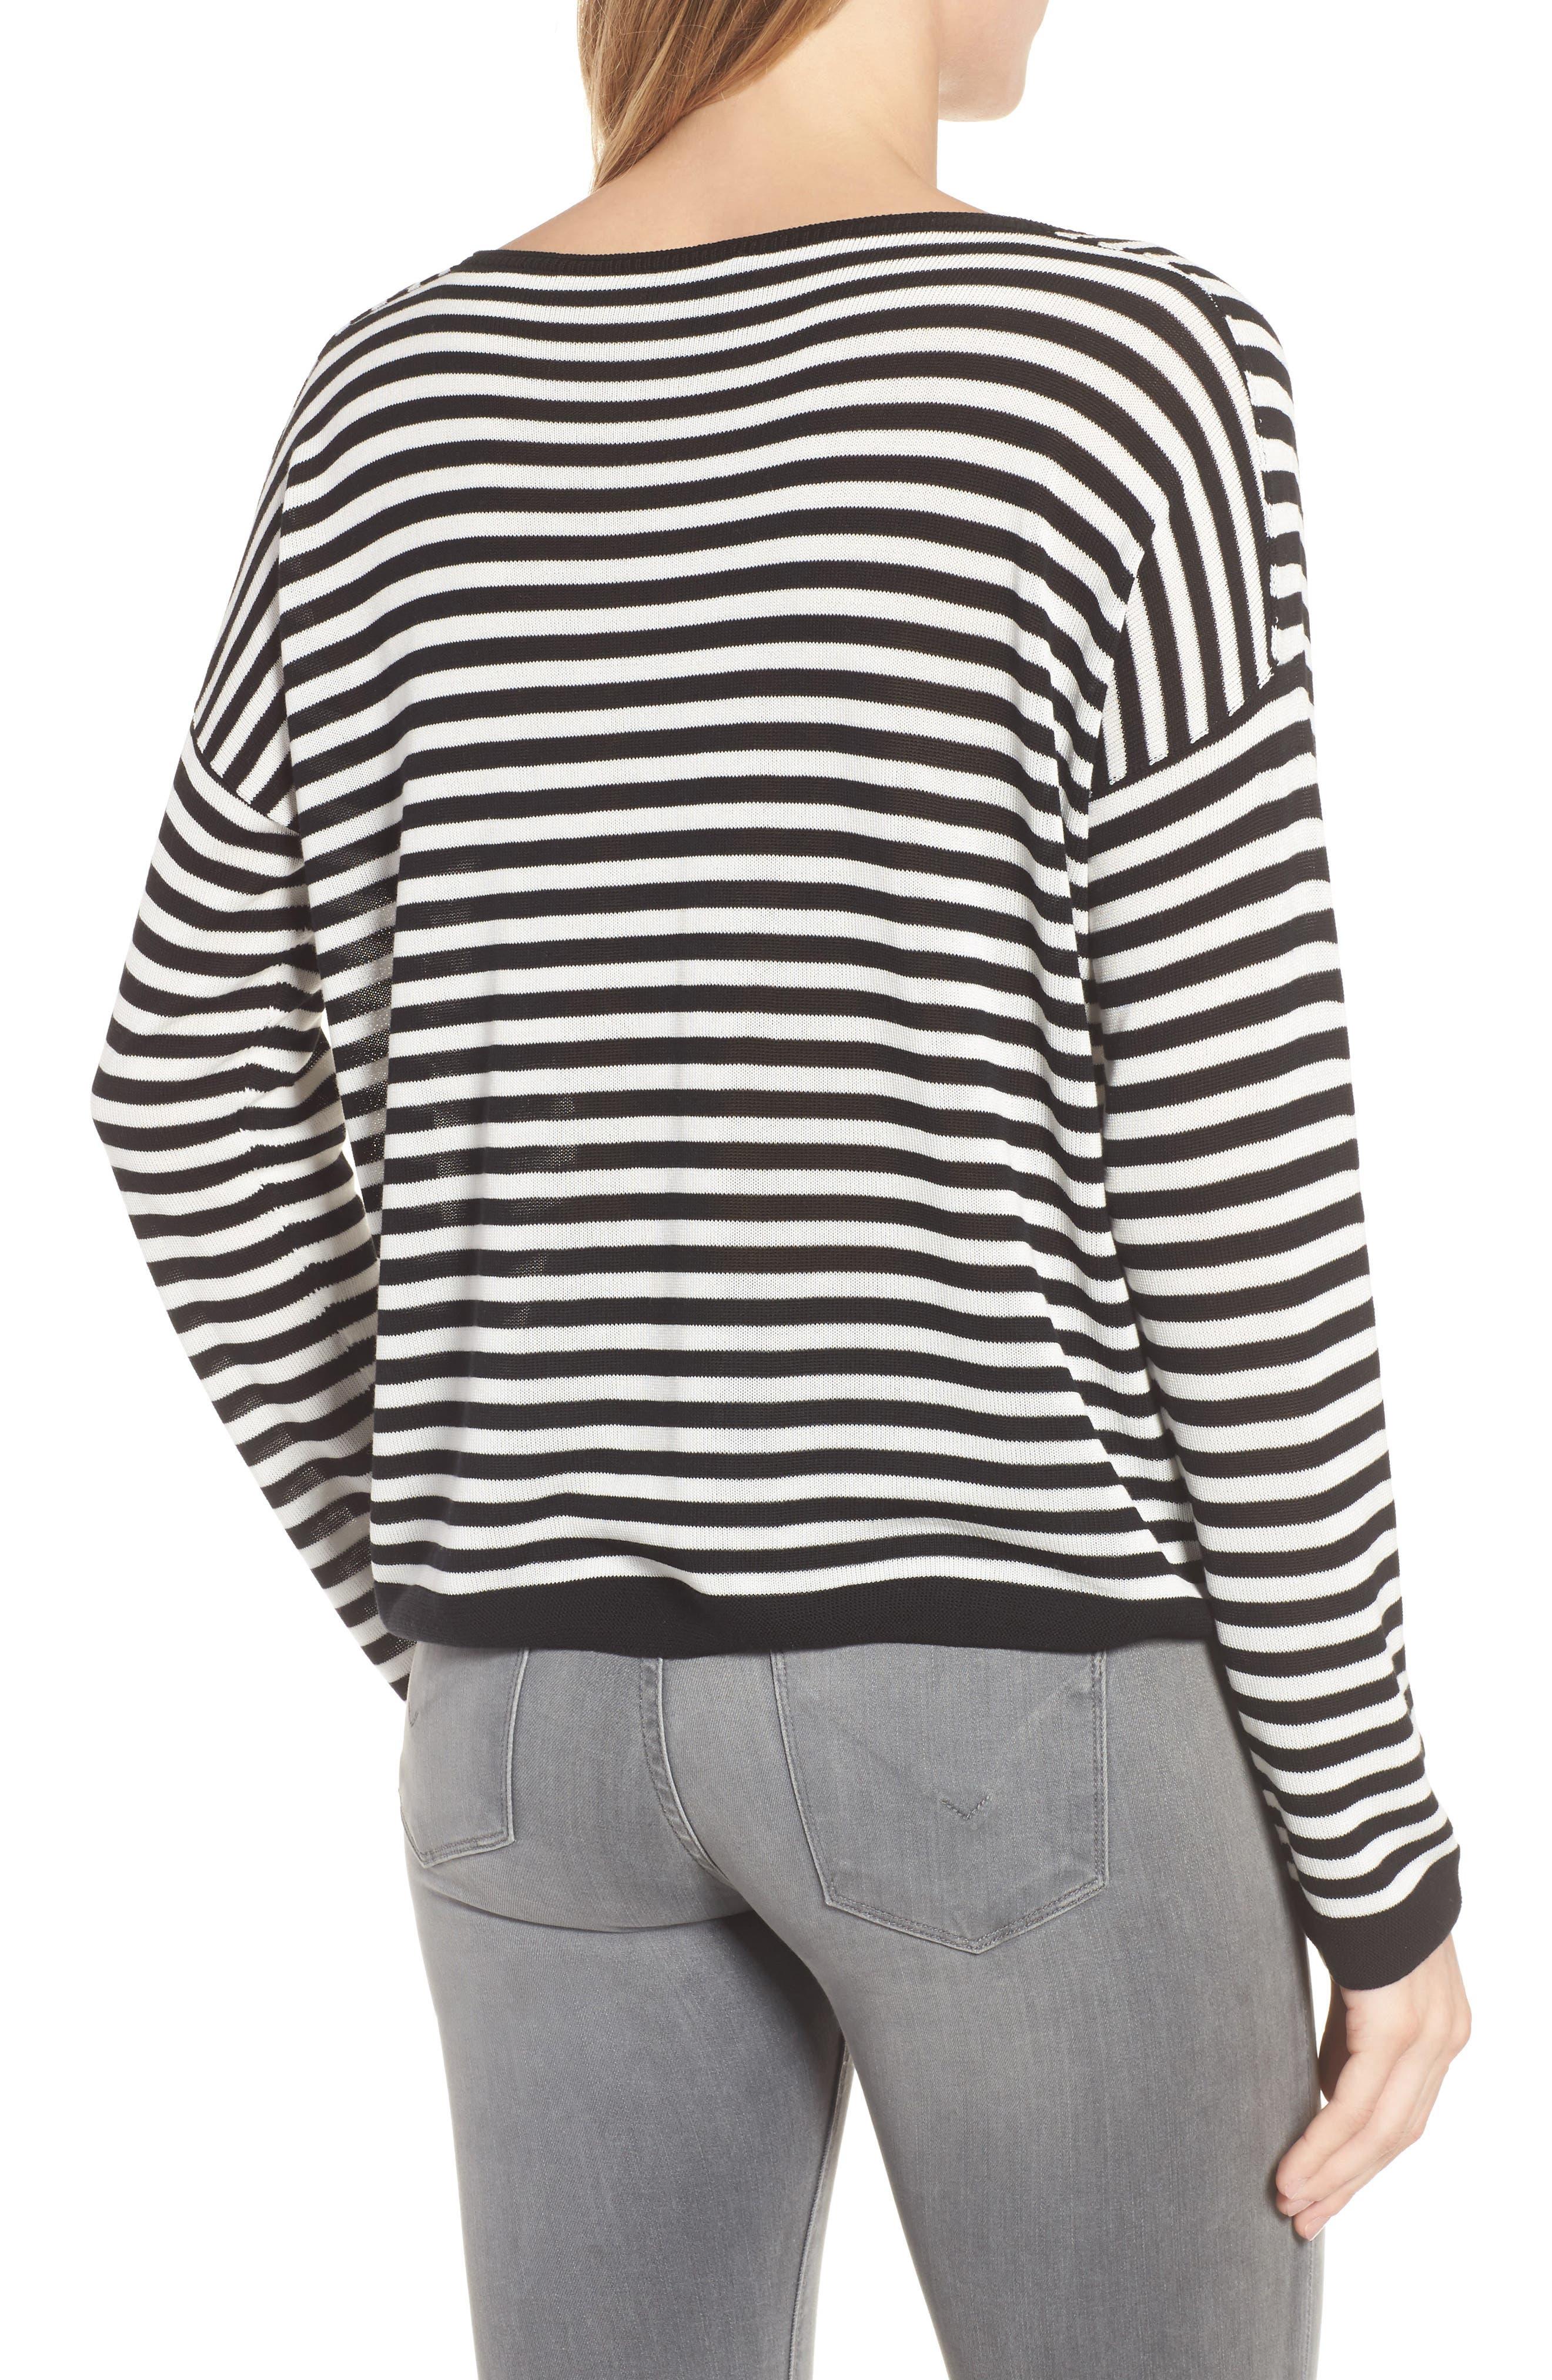 Stripe Tencel<sup>®</sup> Lyocell Knit Sweater,                             Alternate thumbnail 2, color,                             Black/ Soft White